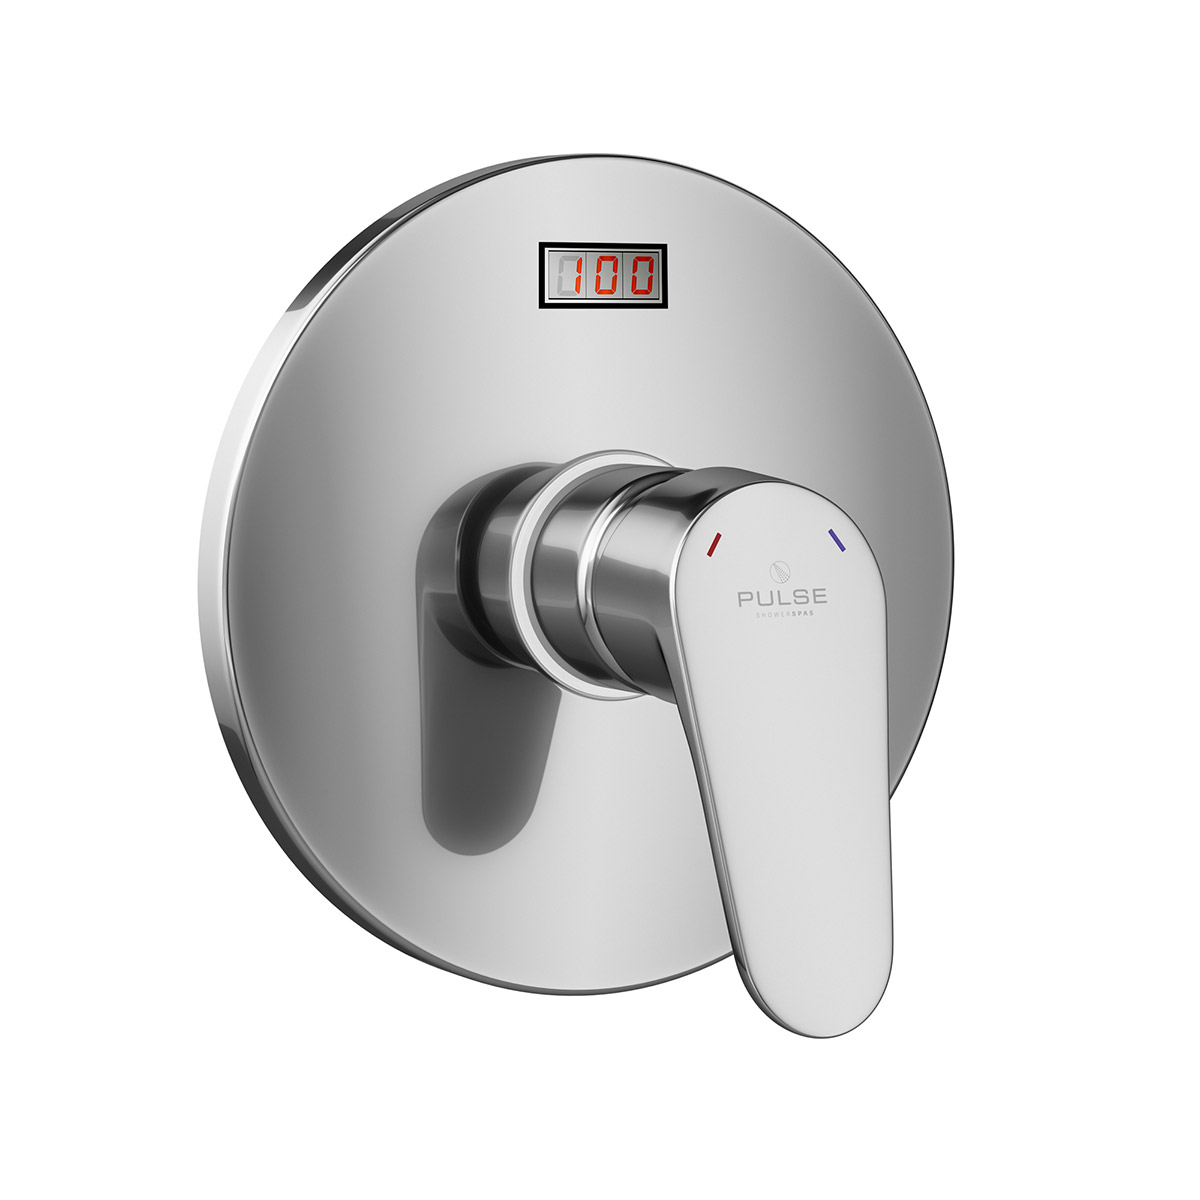 PULSE ShowerSpas LED TruTemp Pressure Balance Valve with Chrome Trim Kit